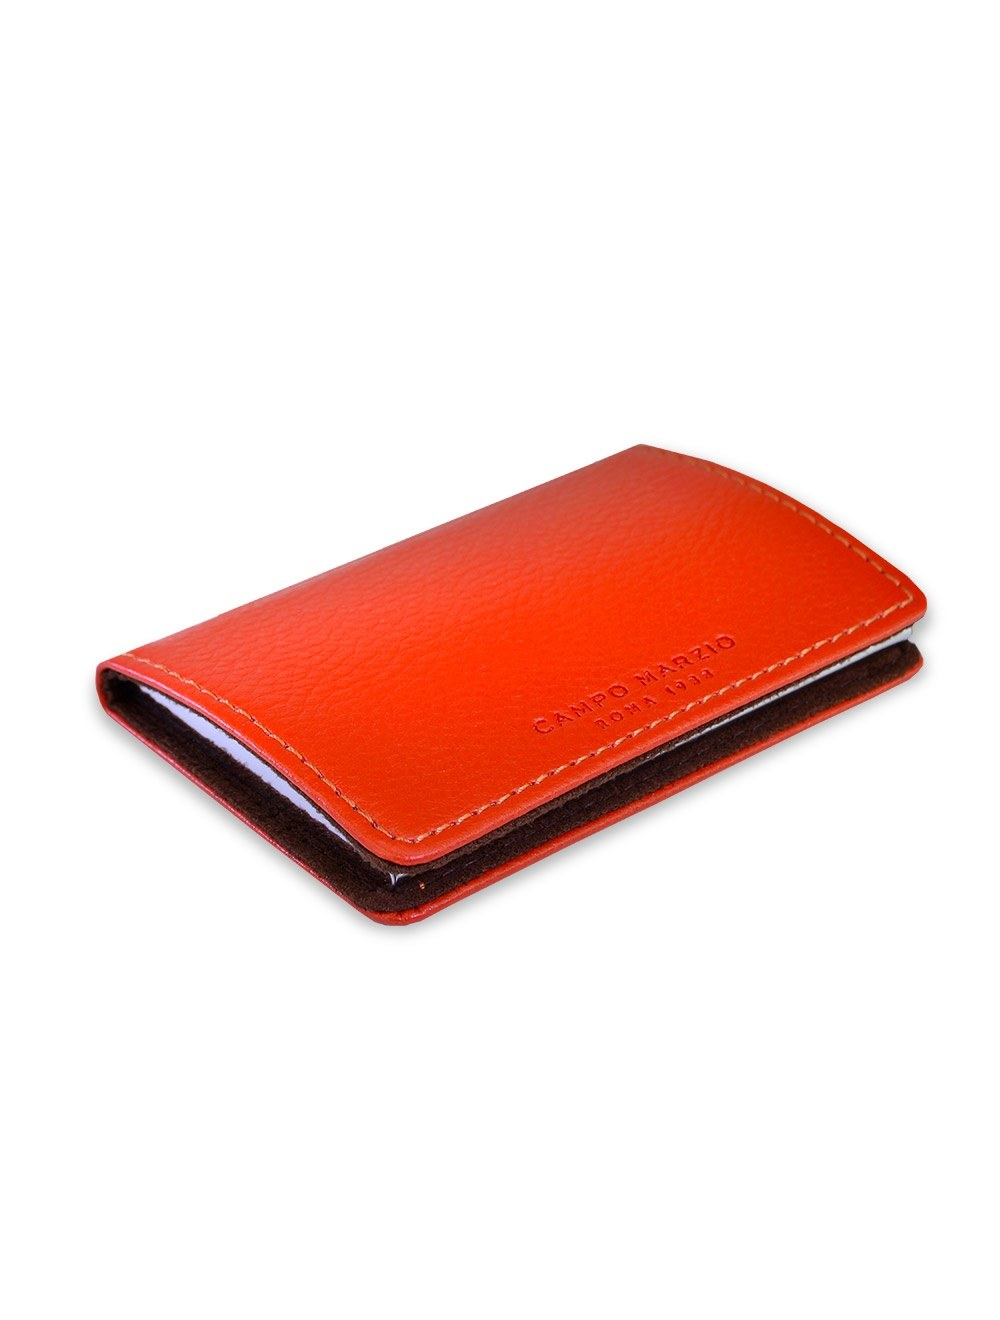 Business Card Holder W/Magnet